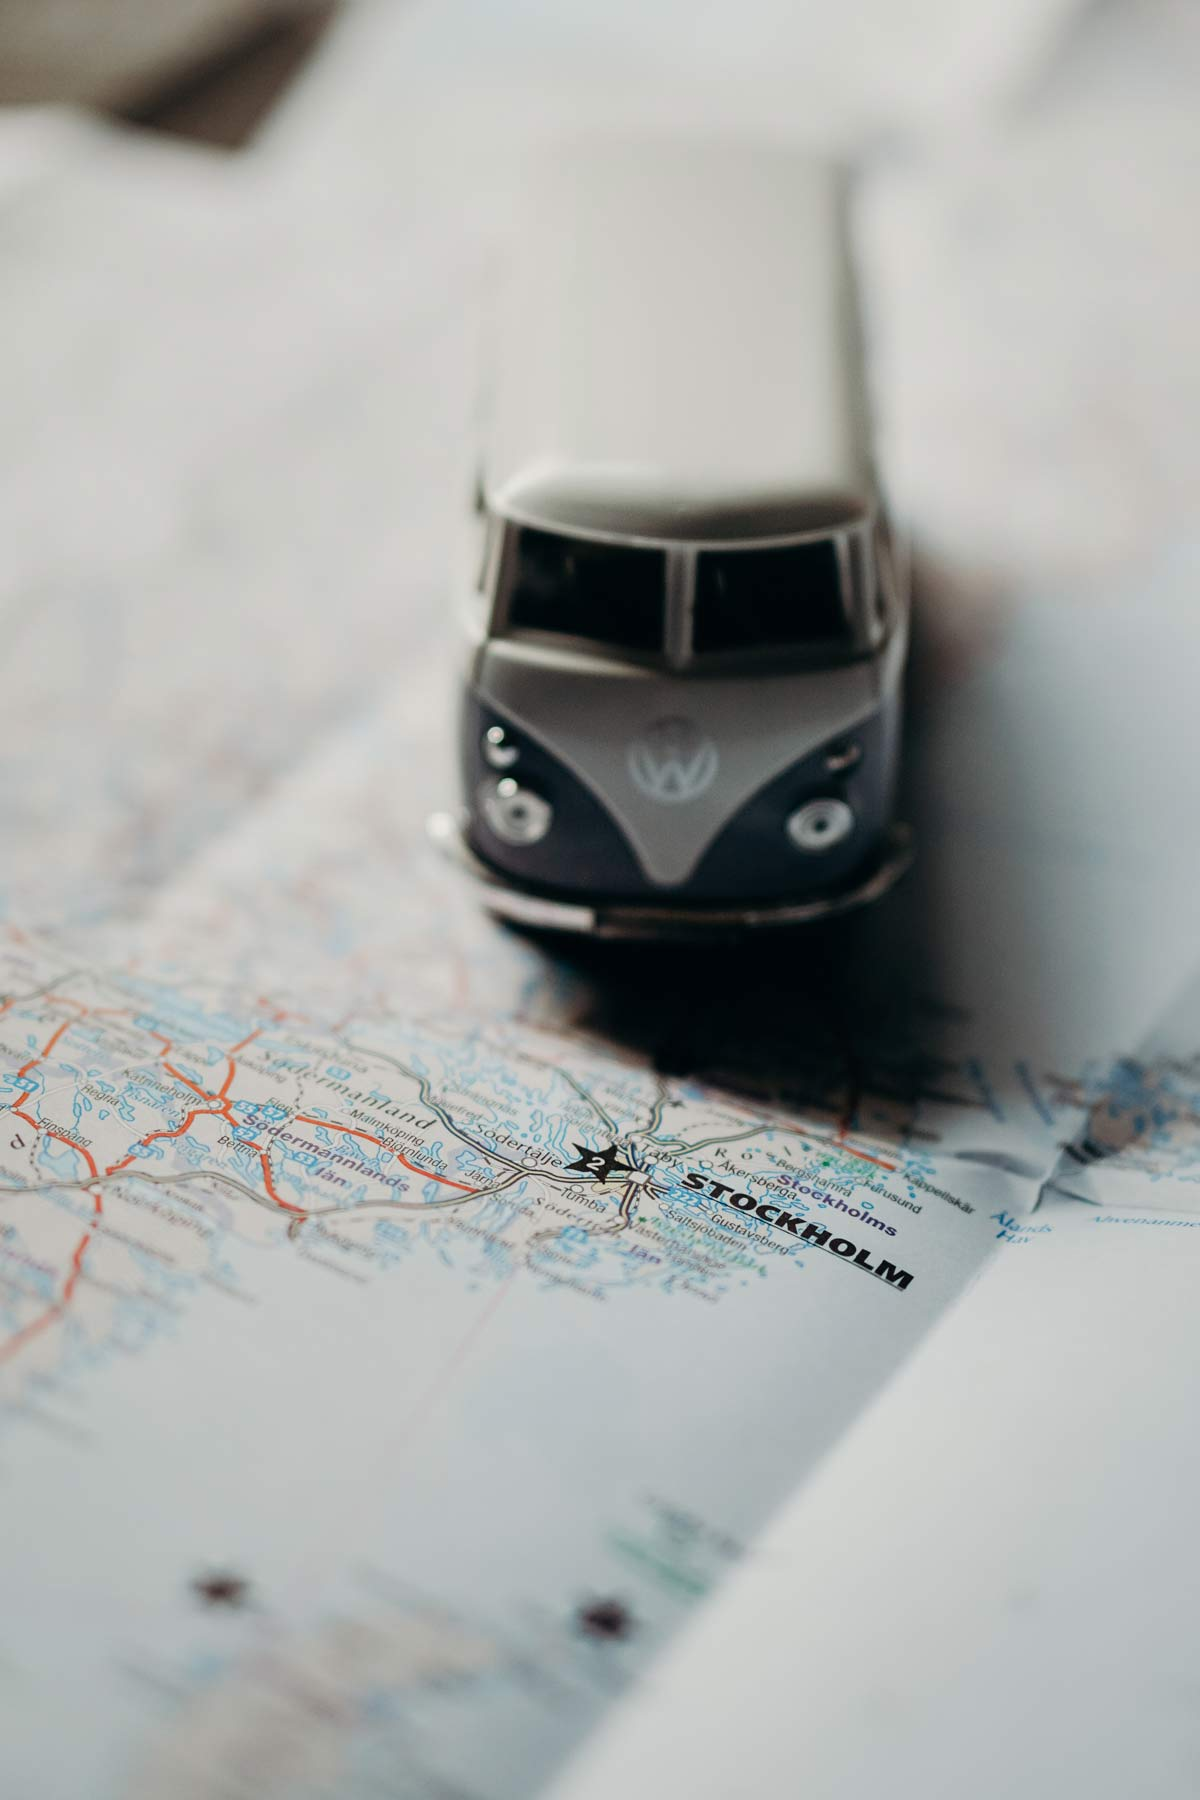 Stockholm Reisekarte